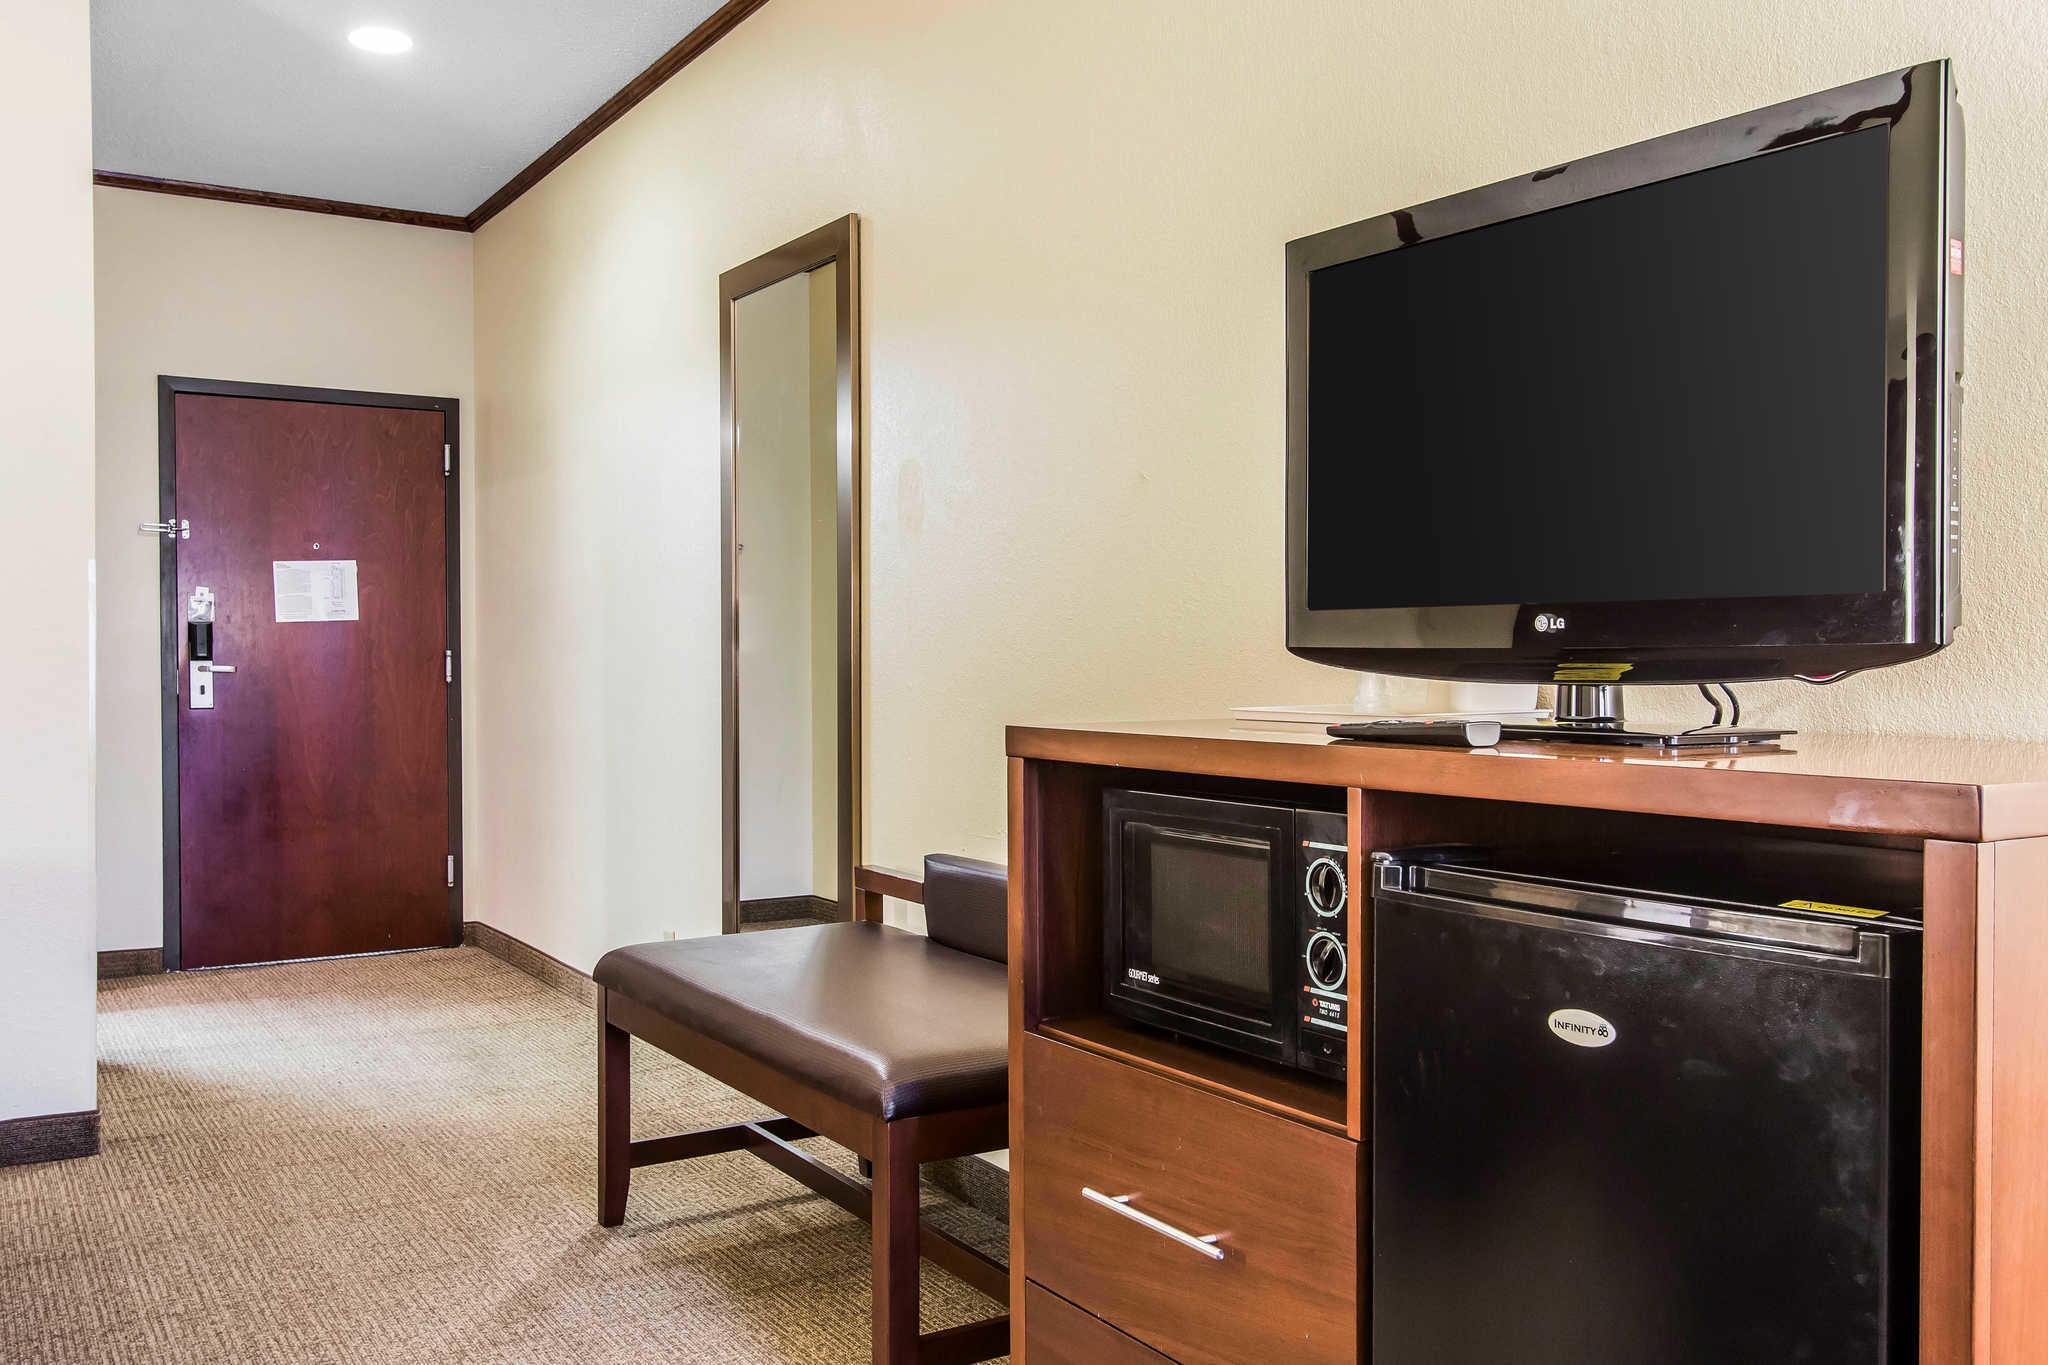 Comfort Inn & Suites Ardmore image 22